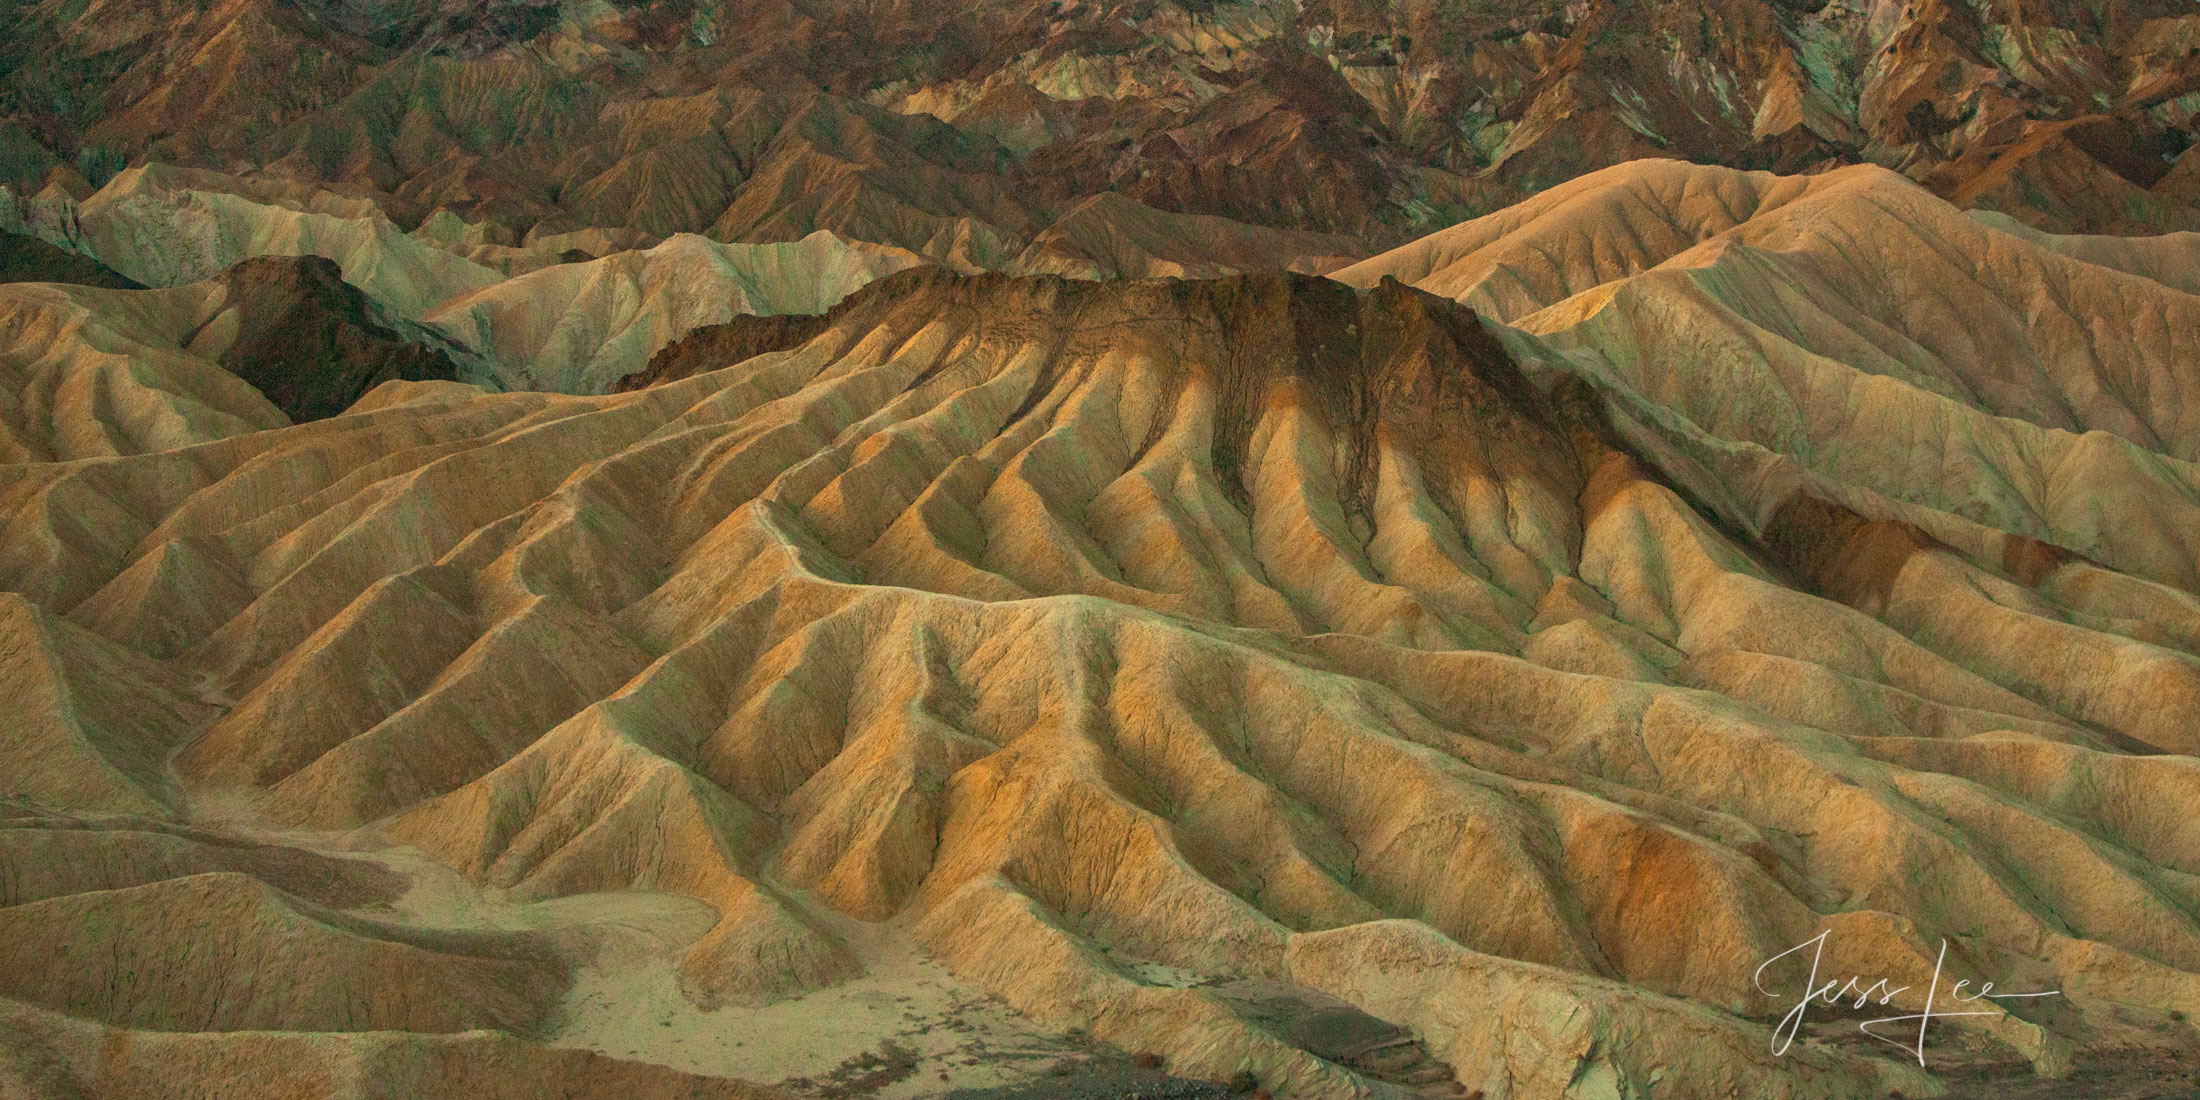 Burnt Edges of the Earth